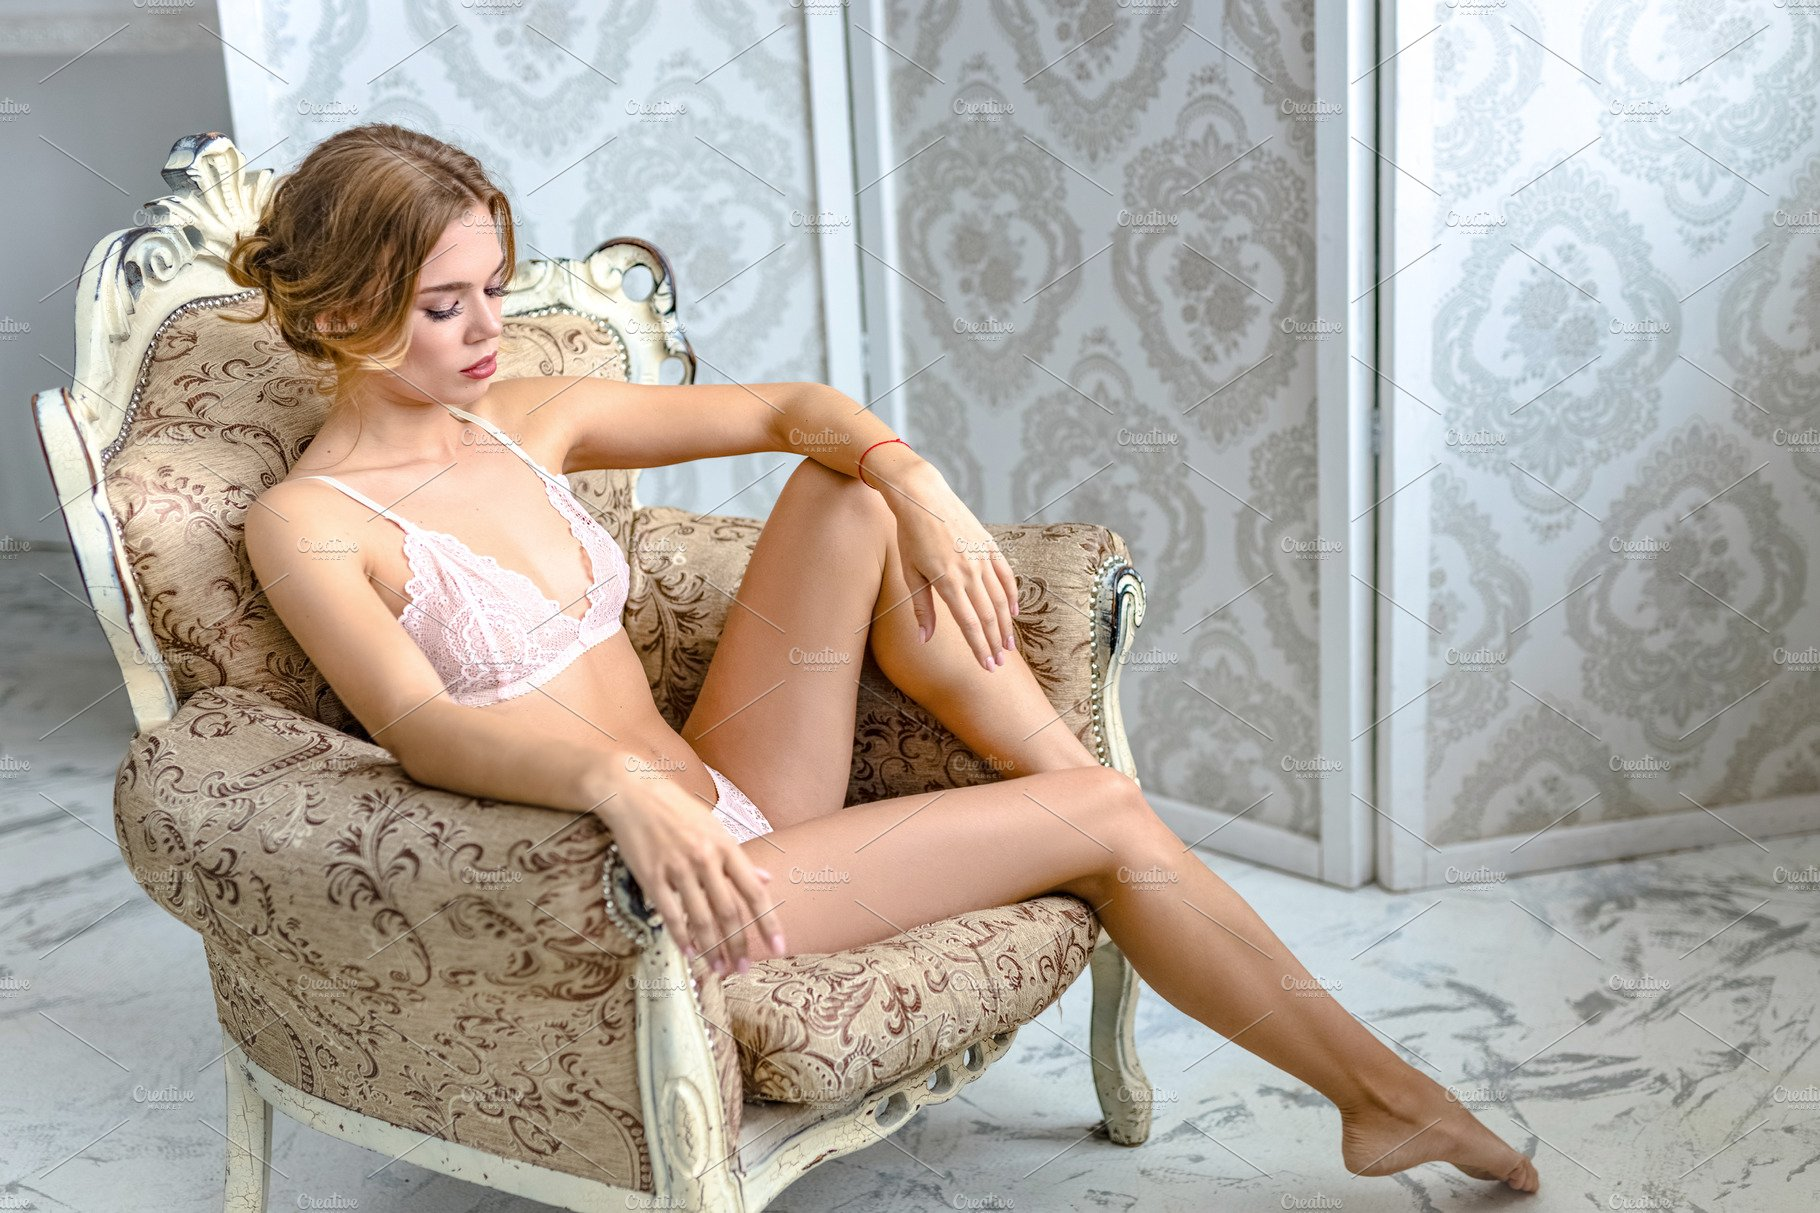 Female hot pics sexy Kate Upton